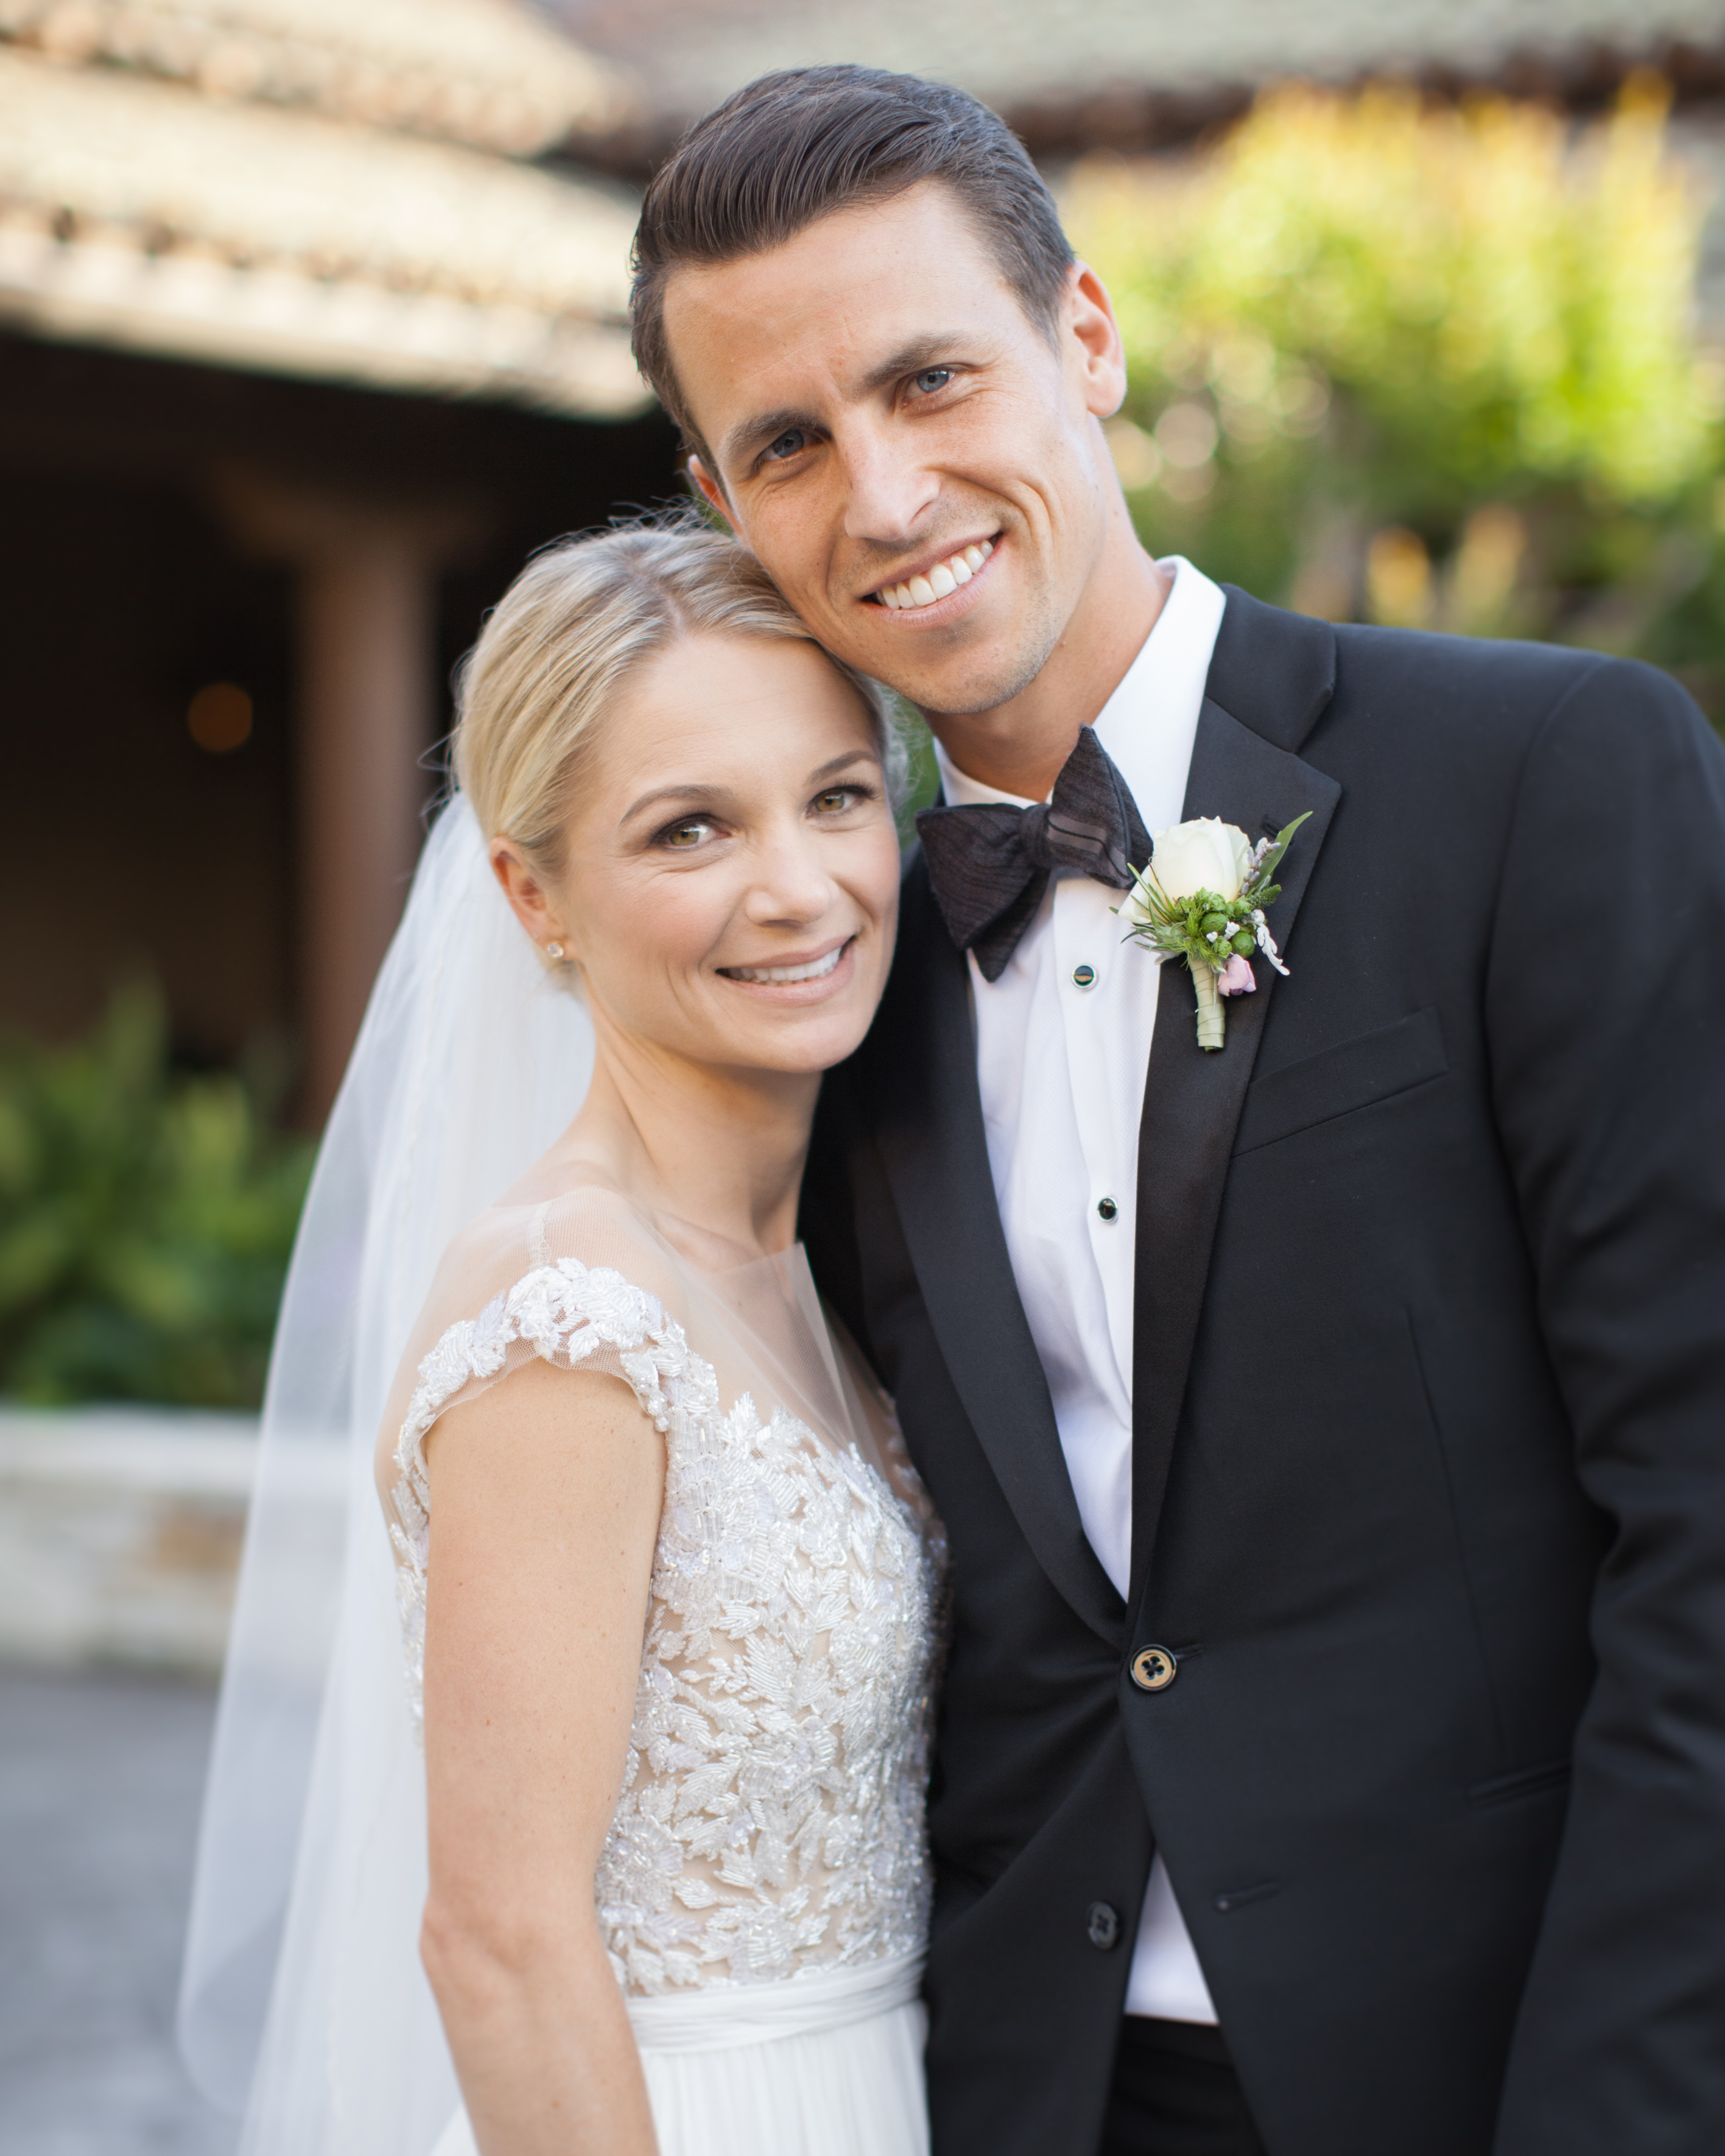 kristin-chris-wedding-couple-471-s112398-0116.jpg